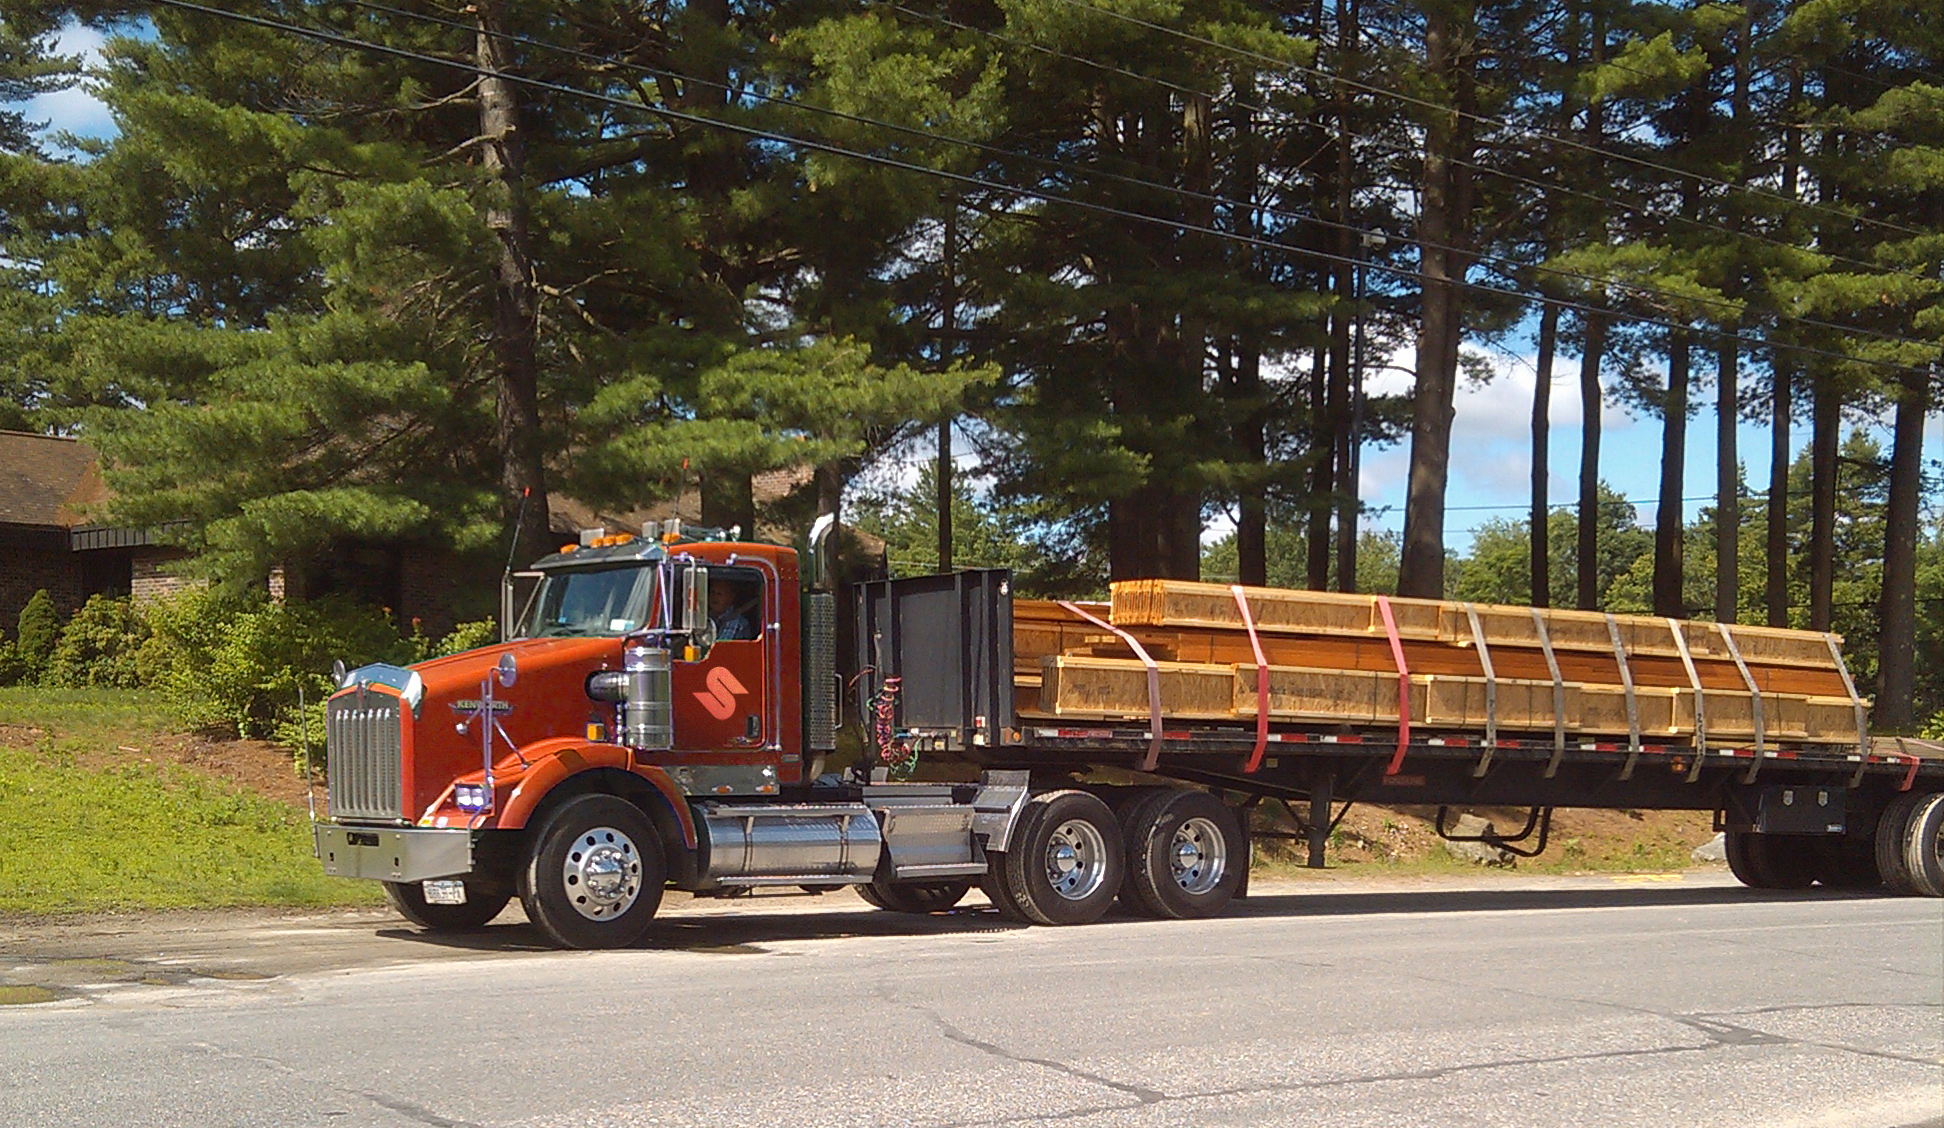 Stuck lumber truck dumping load - YouTube